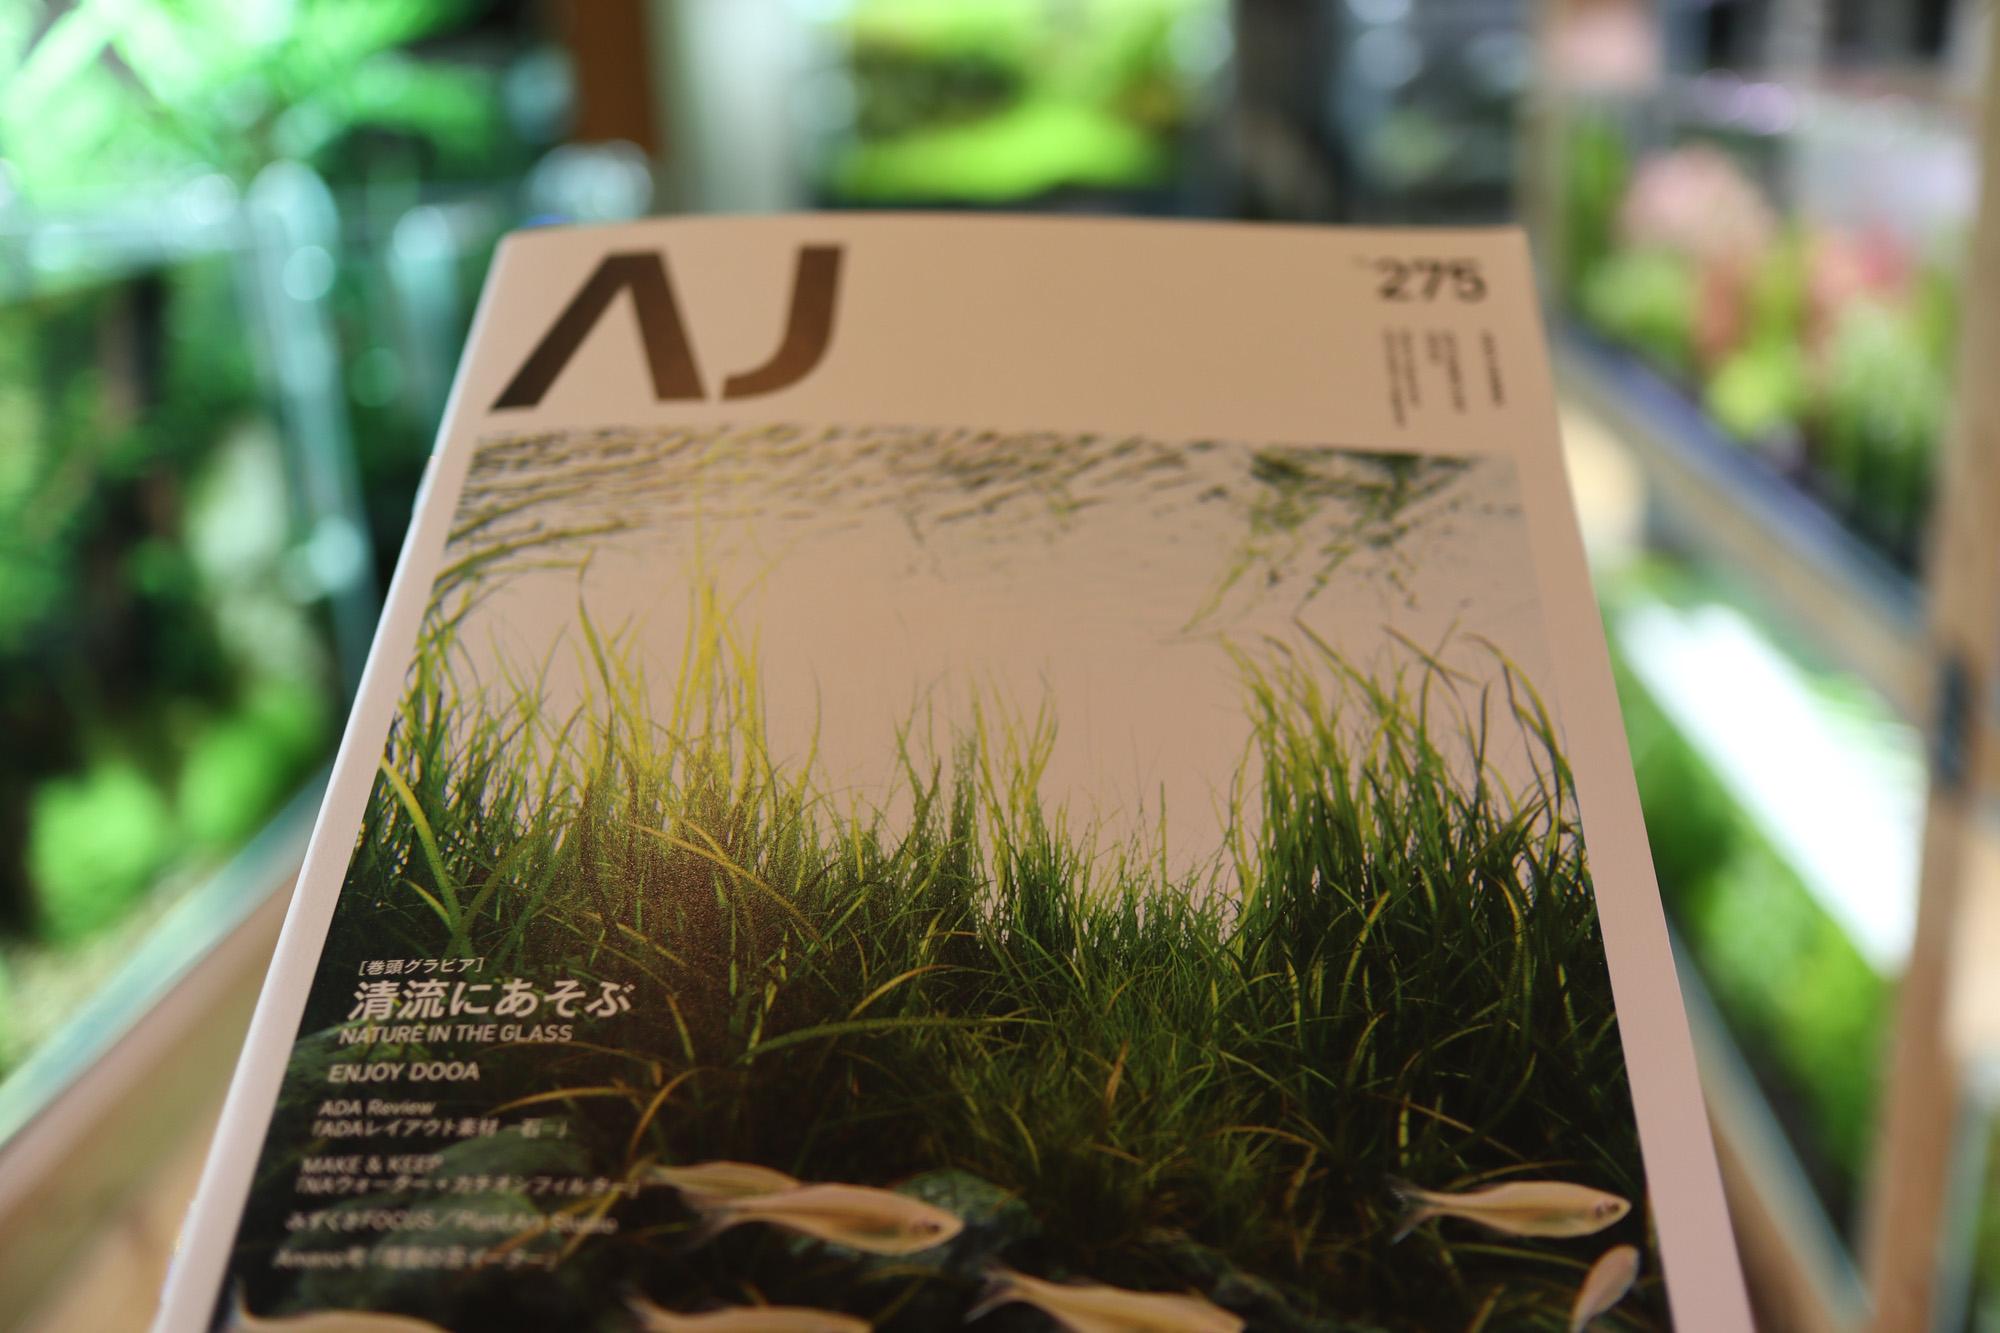 ADAアクアジャーナル最新号入荷